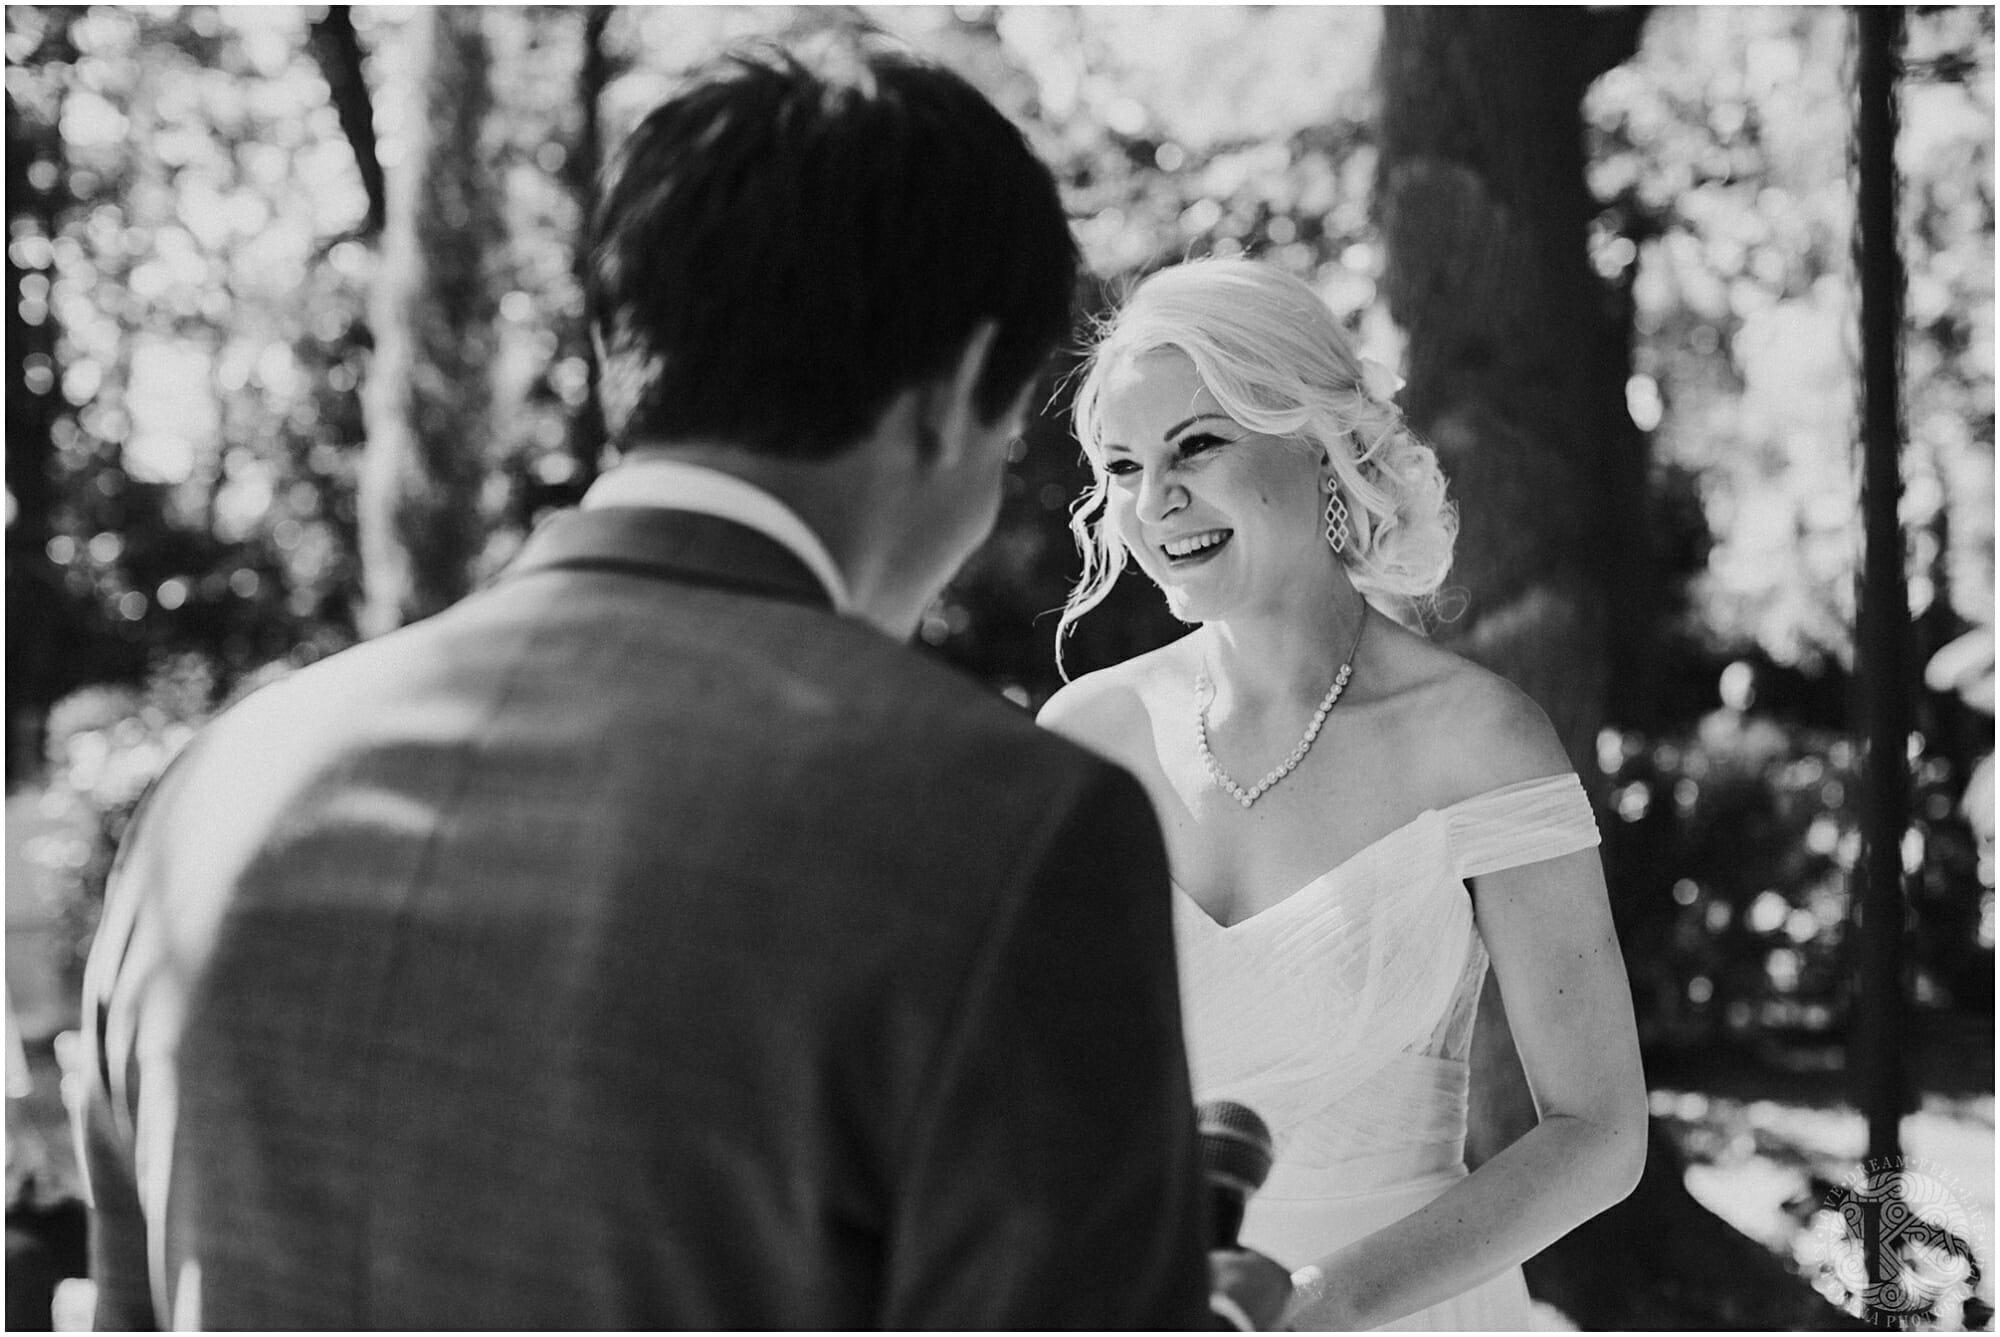 Kateryna-photos-photographe-mariage-chateau-des-3-fontaines-provence-avignon-vaucluse-sud_0057.jpg